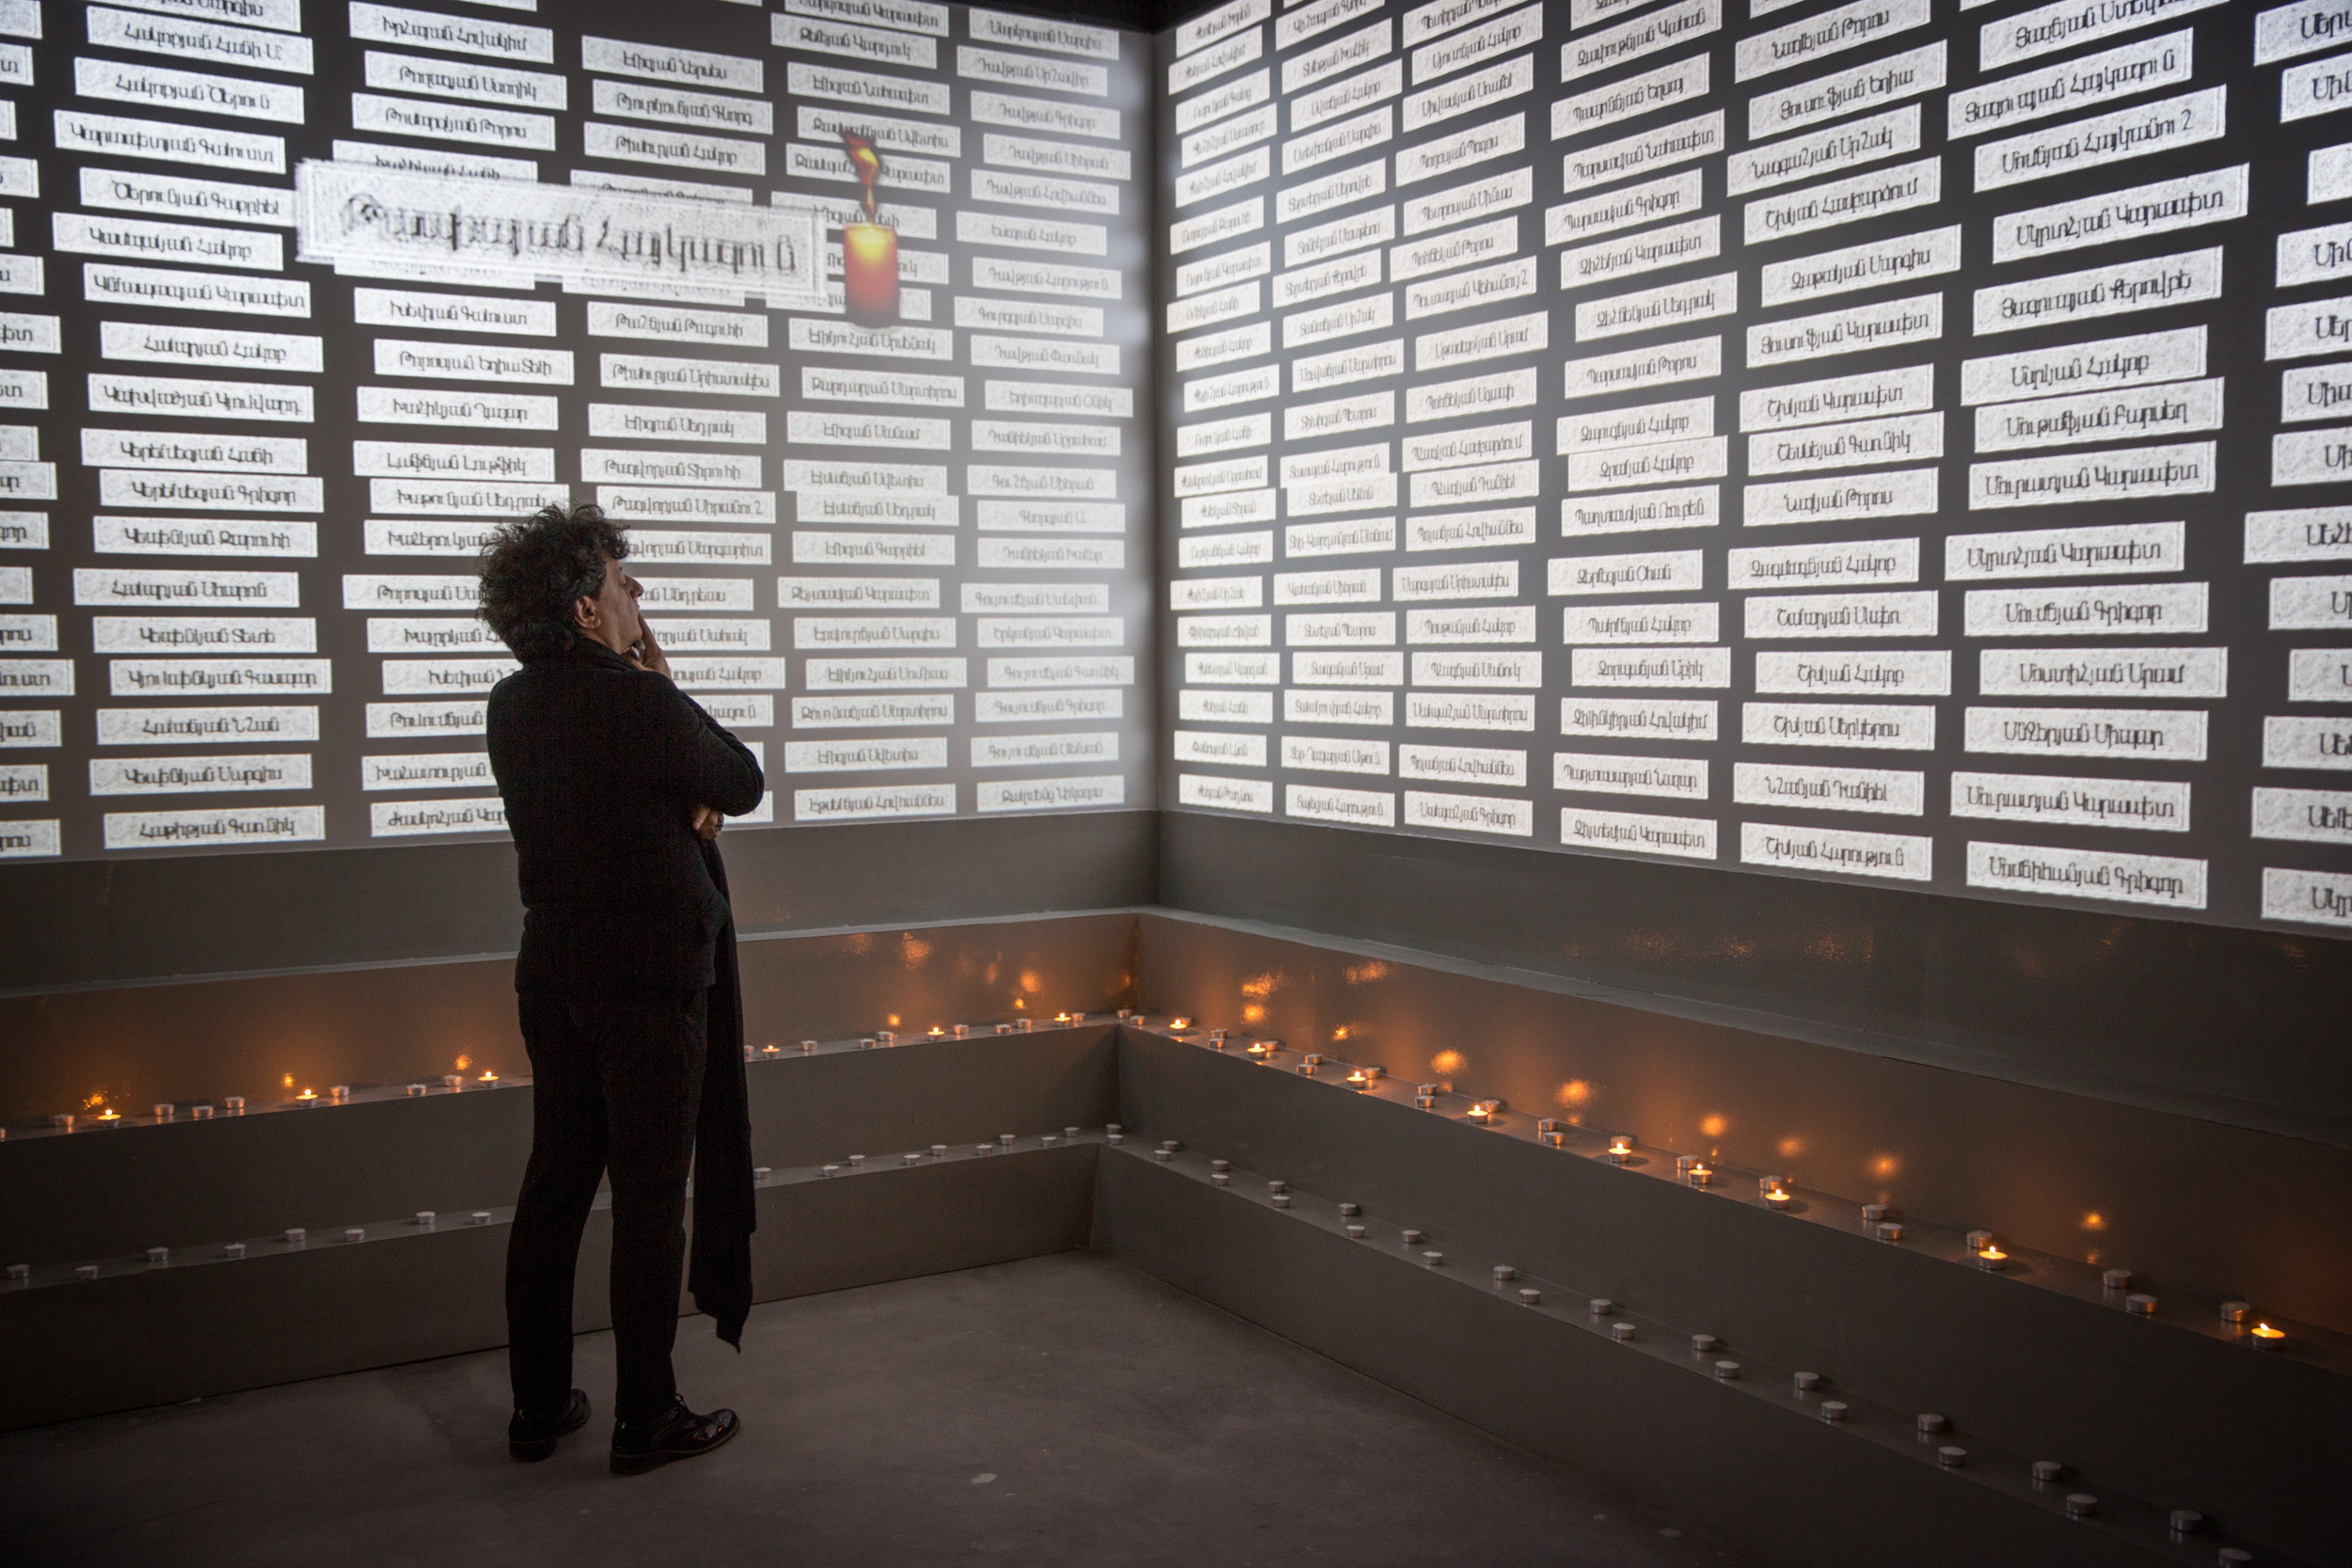 ....Мемориал..Memorial..Հուշարձան....